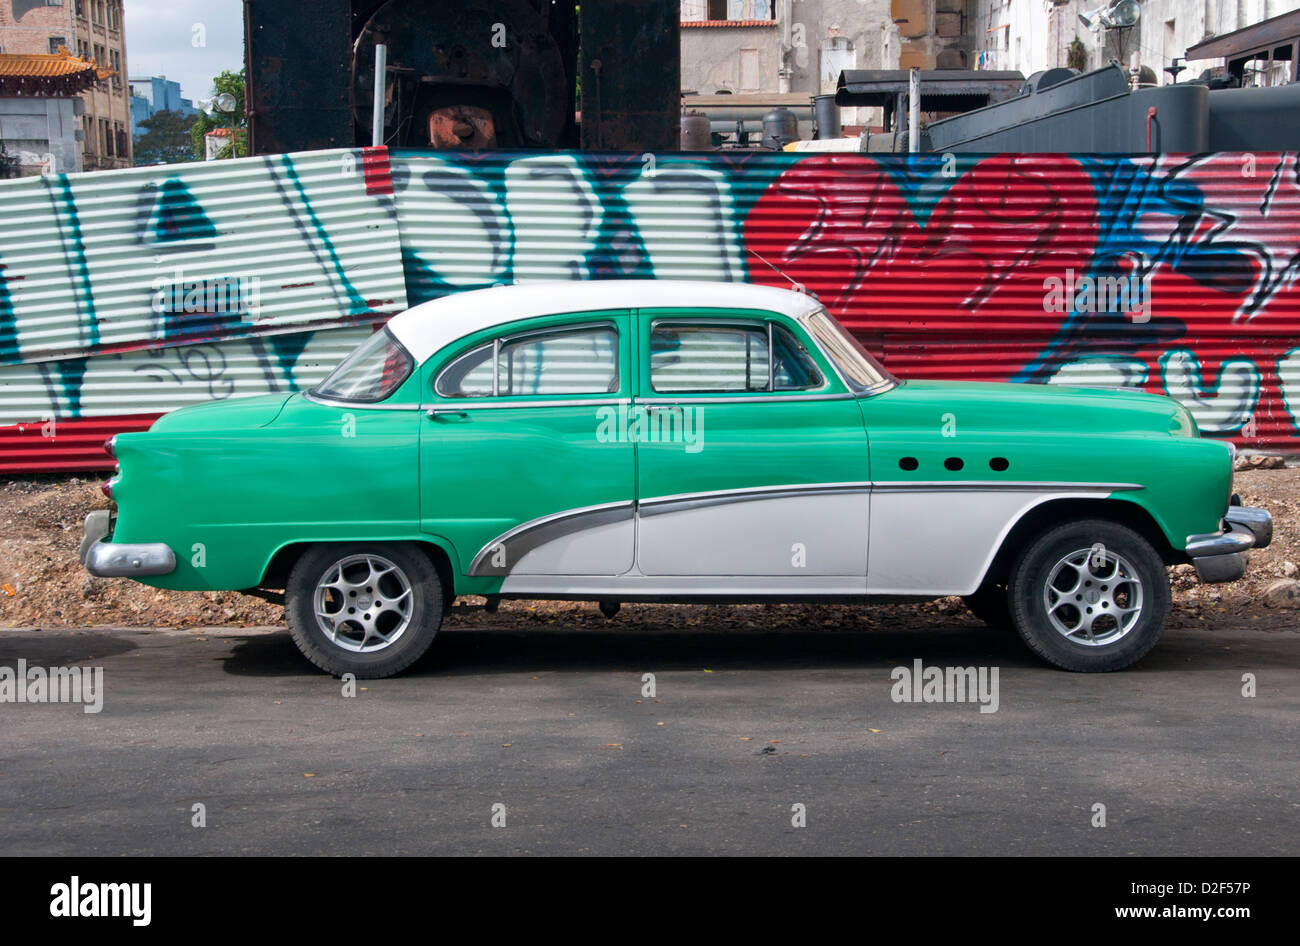 Classic American 1950 voiture en face de mur de graffiti dans les rues de La Havane, La Havane, Cuba Photo Stock